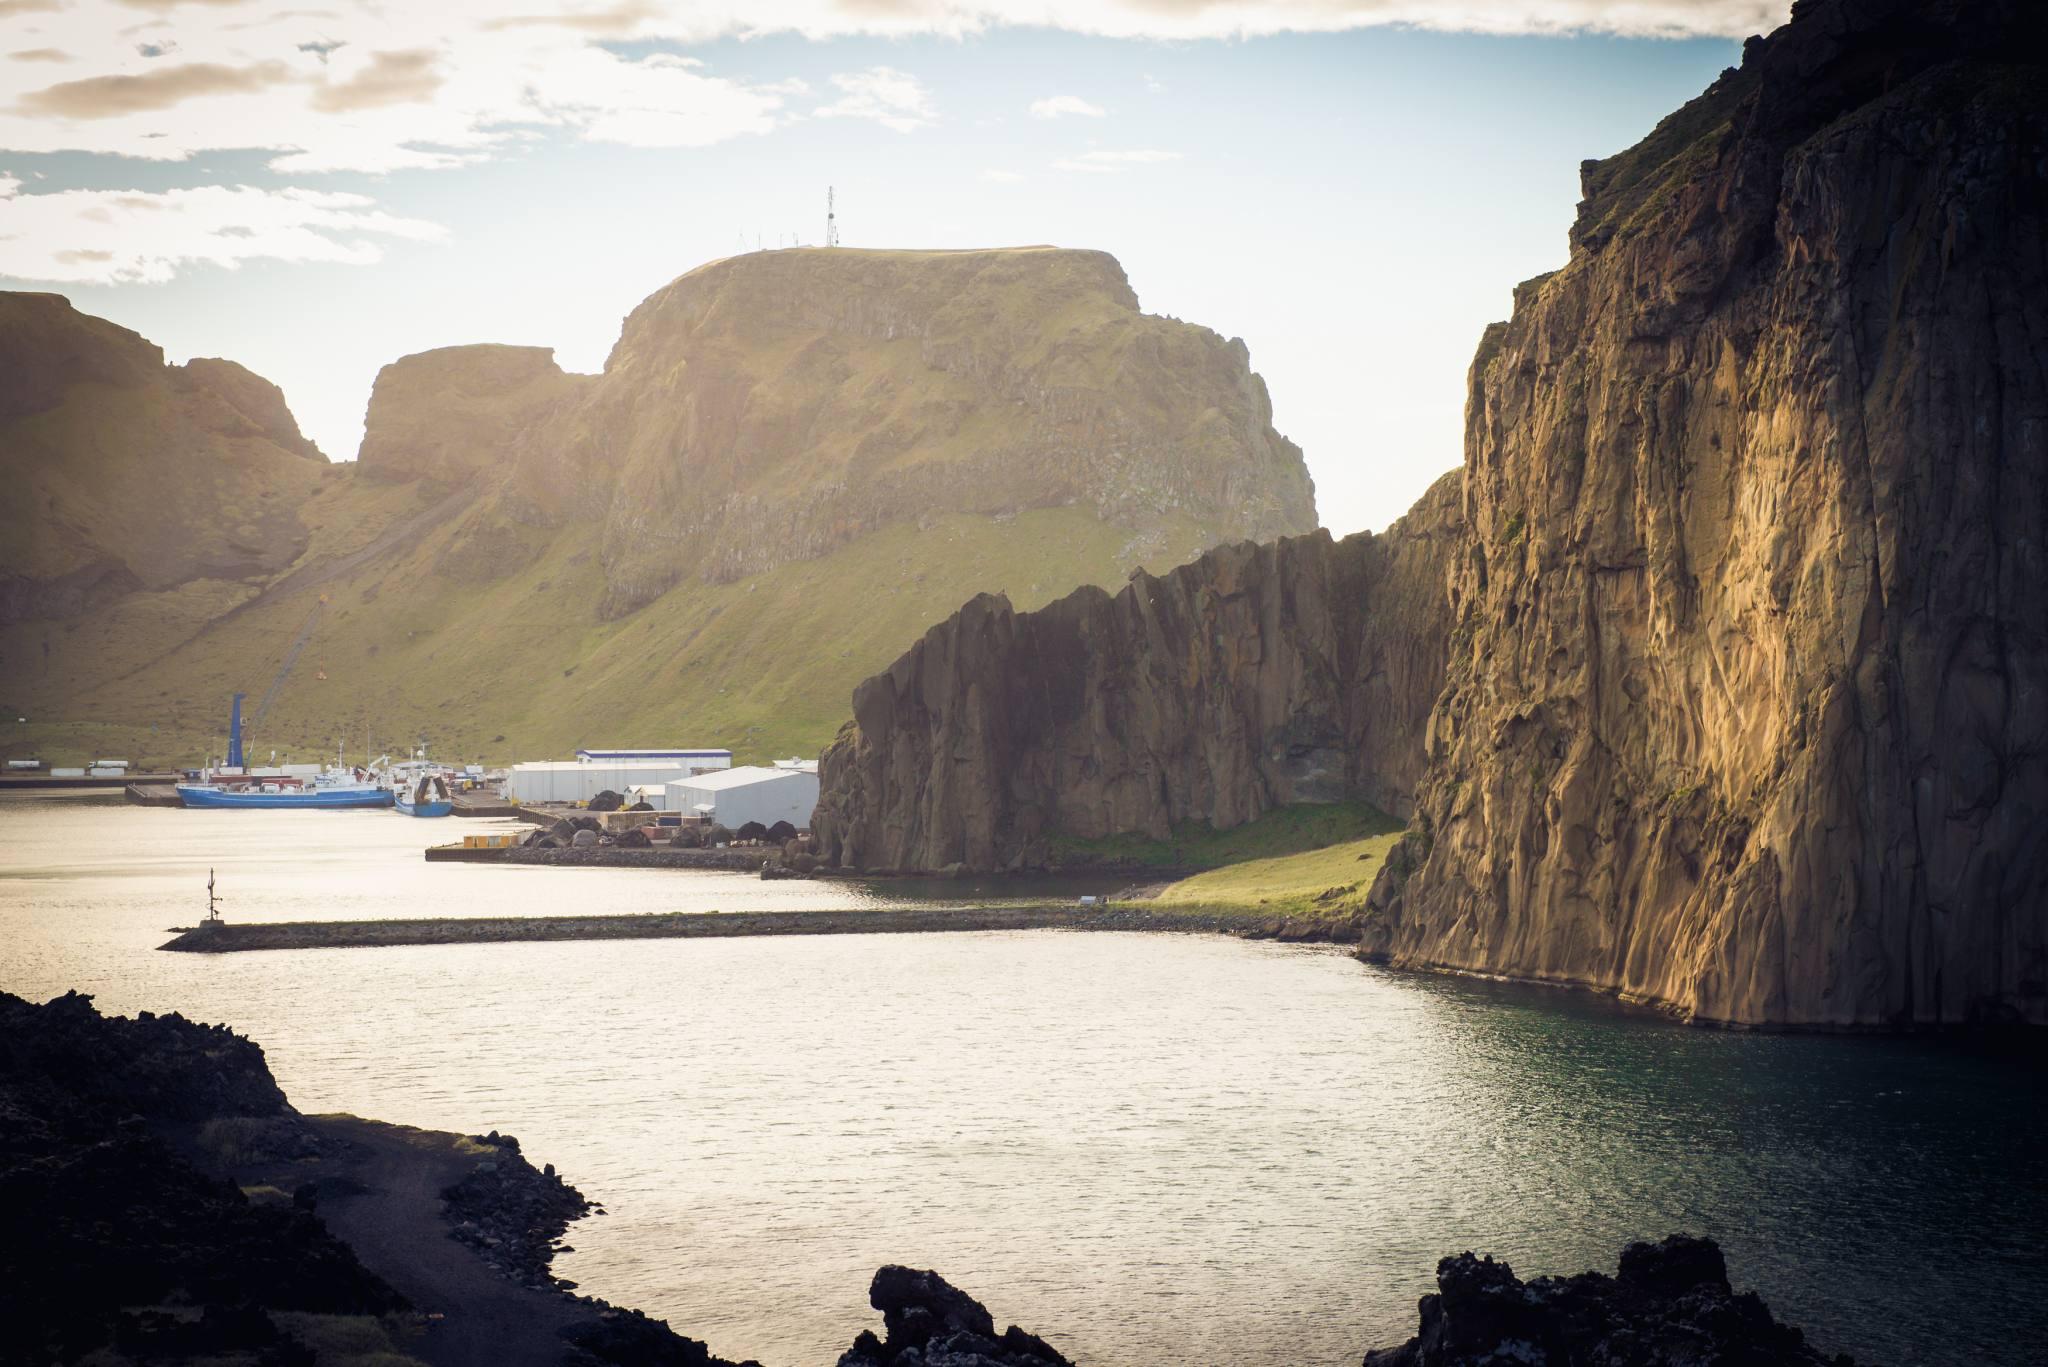 Harbour Bay - Vestmannaeyjar Private Day Tour from Reykjavik